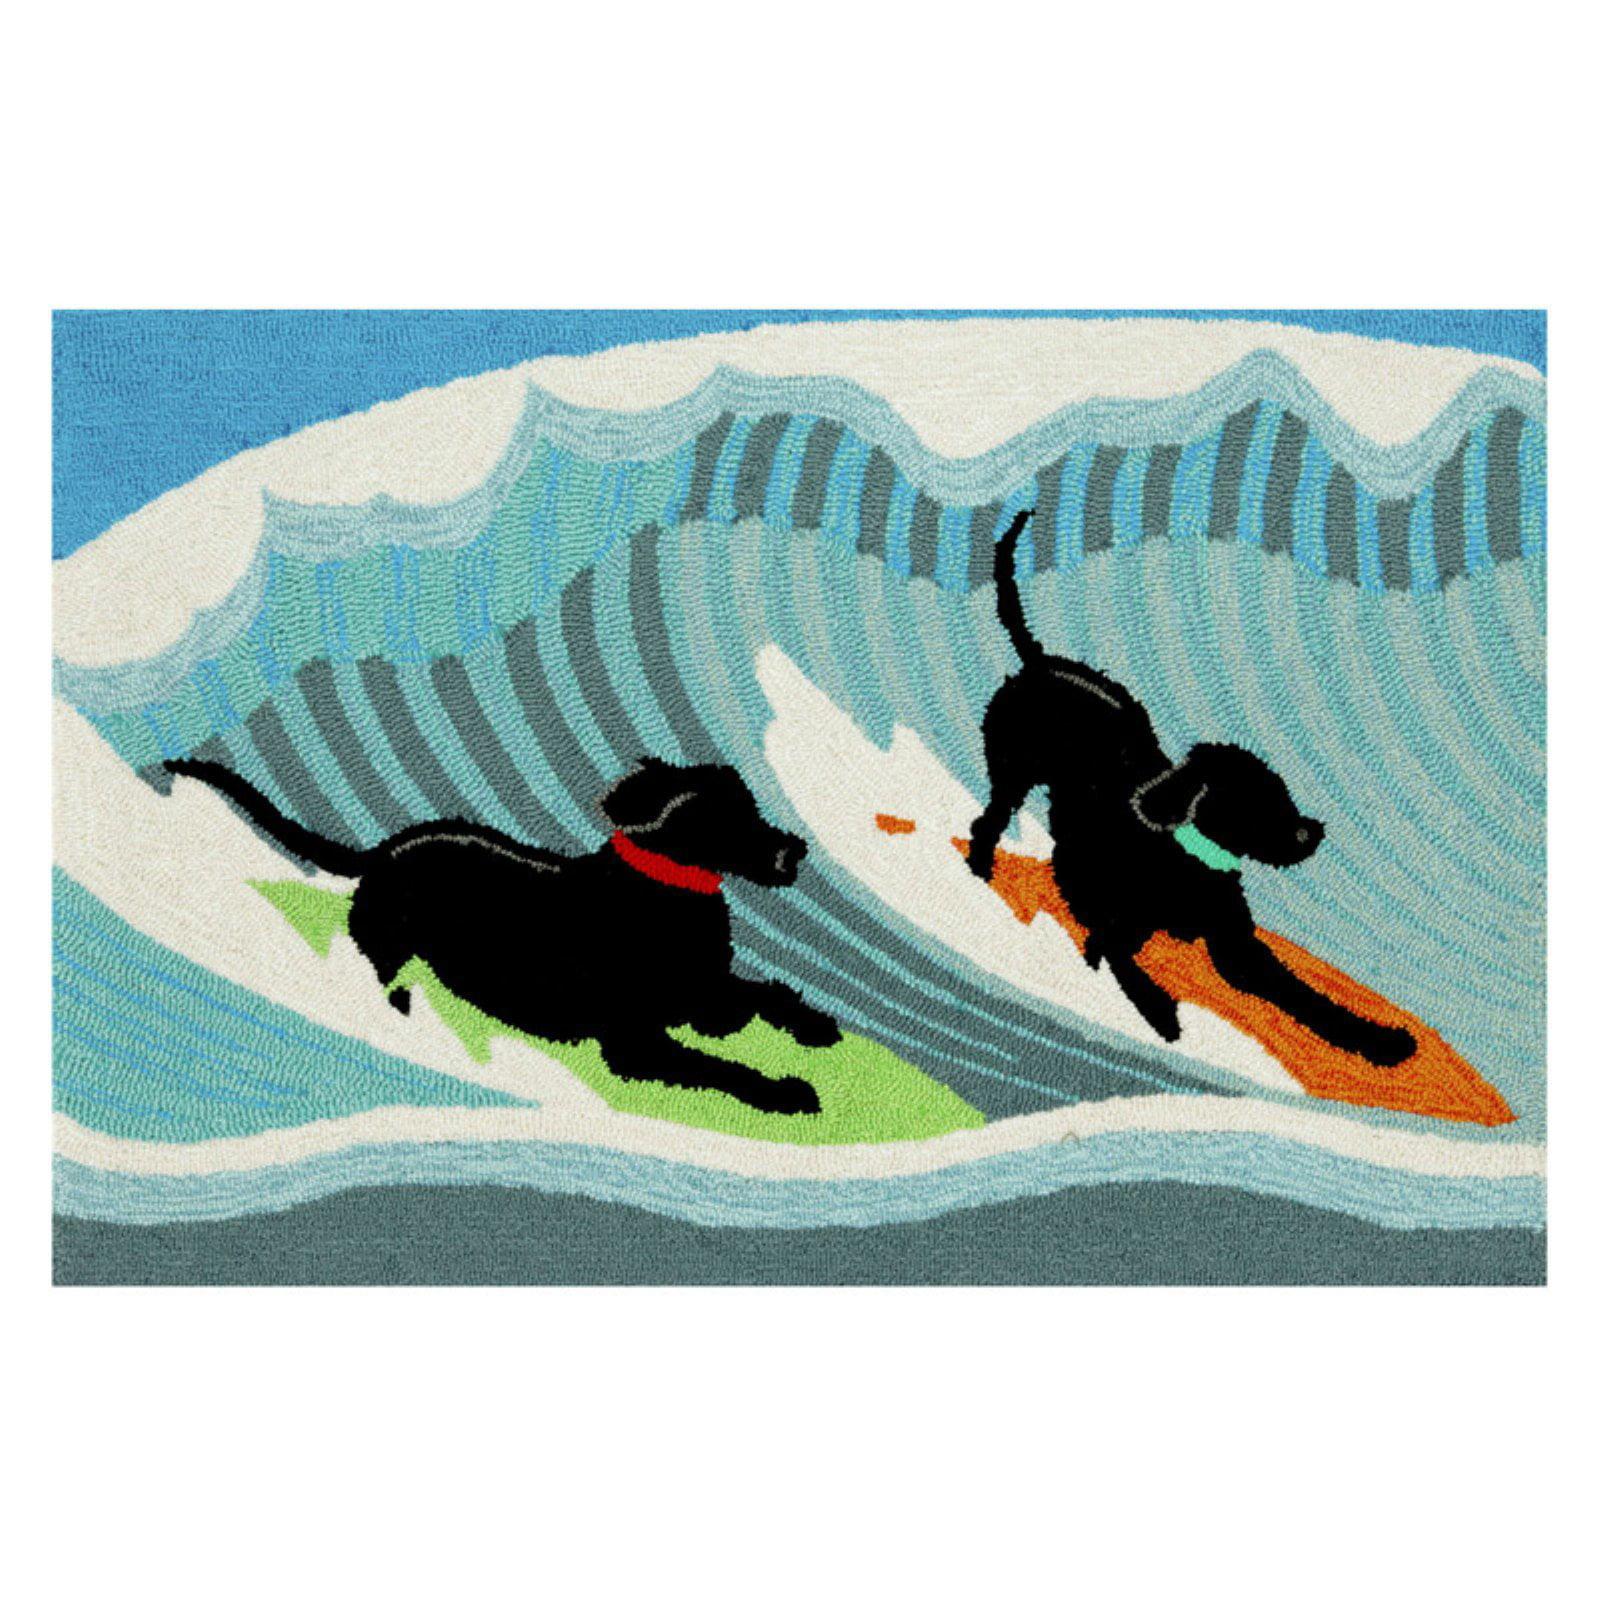 Trans-Ocean Rug Frontporch Surfing Dogs Doormat by Supplier Generic